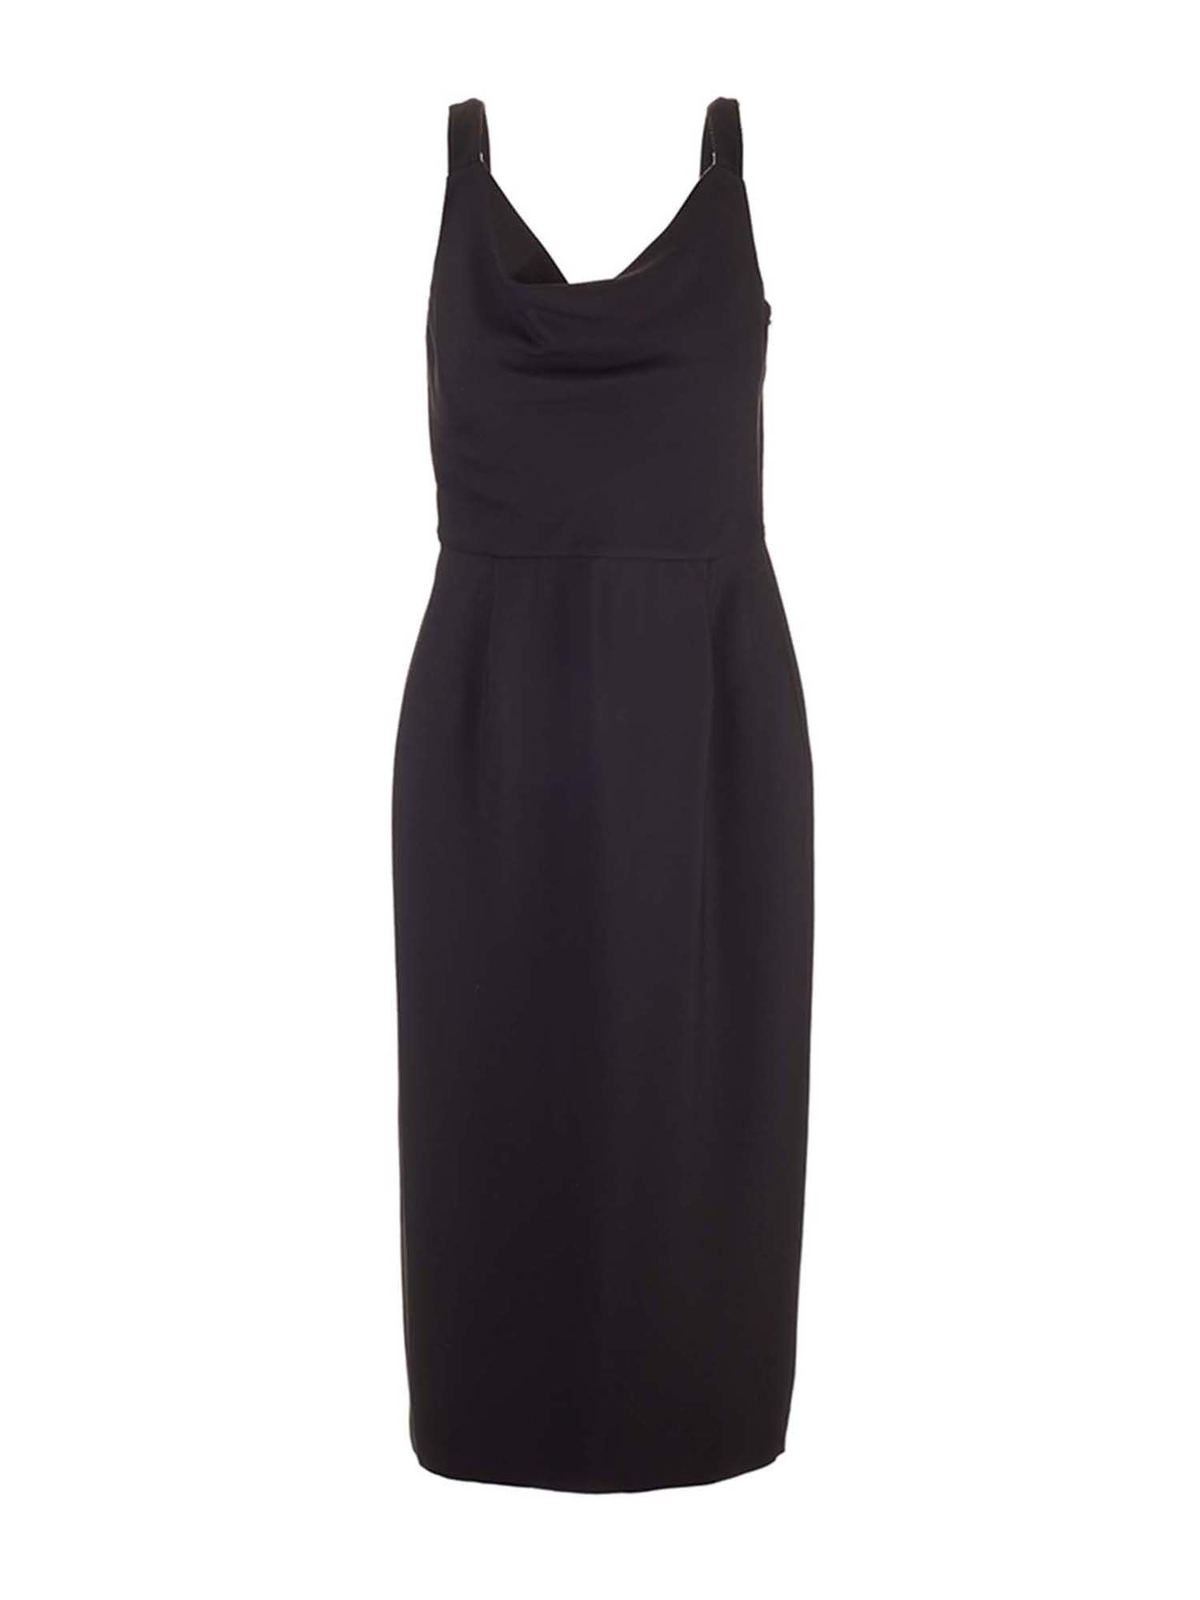 Valentino Dresses SHIFT DRESS IN BLACK